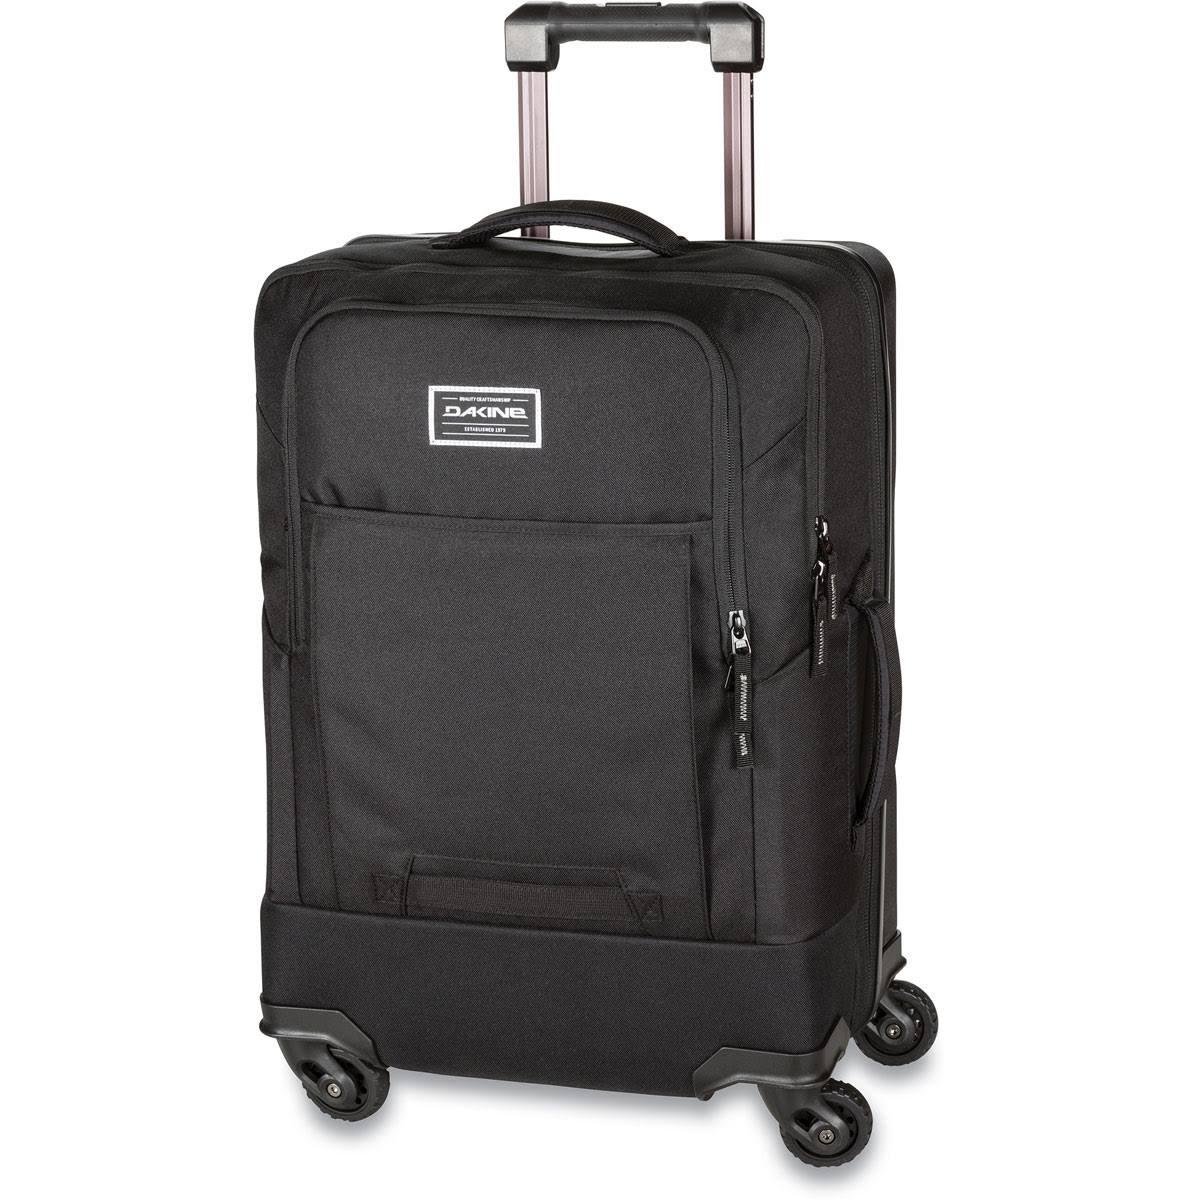 Dakine Unisex Terminal Spinner Wheeled Travel Bag, Black